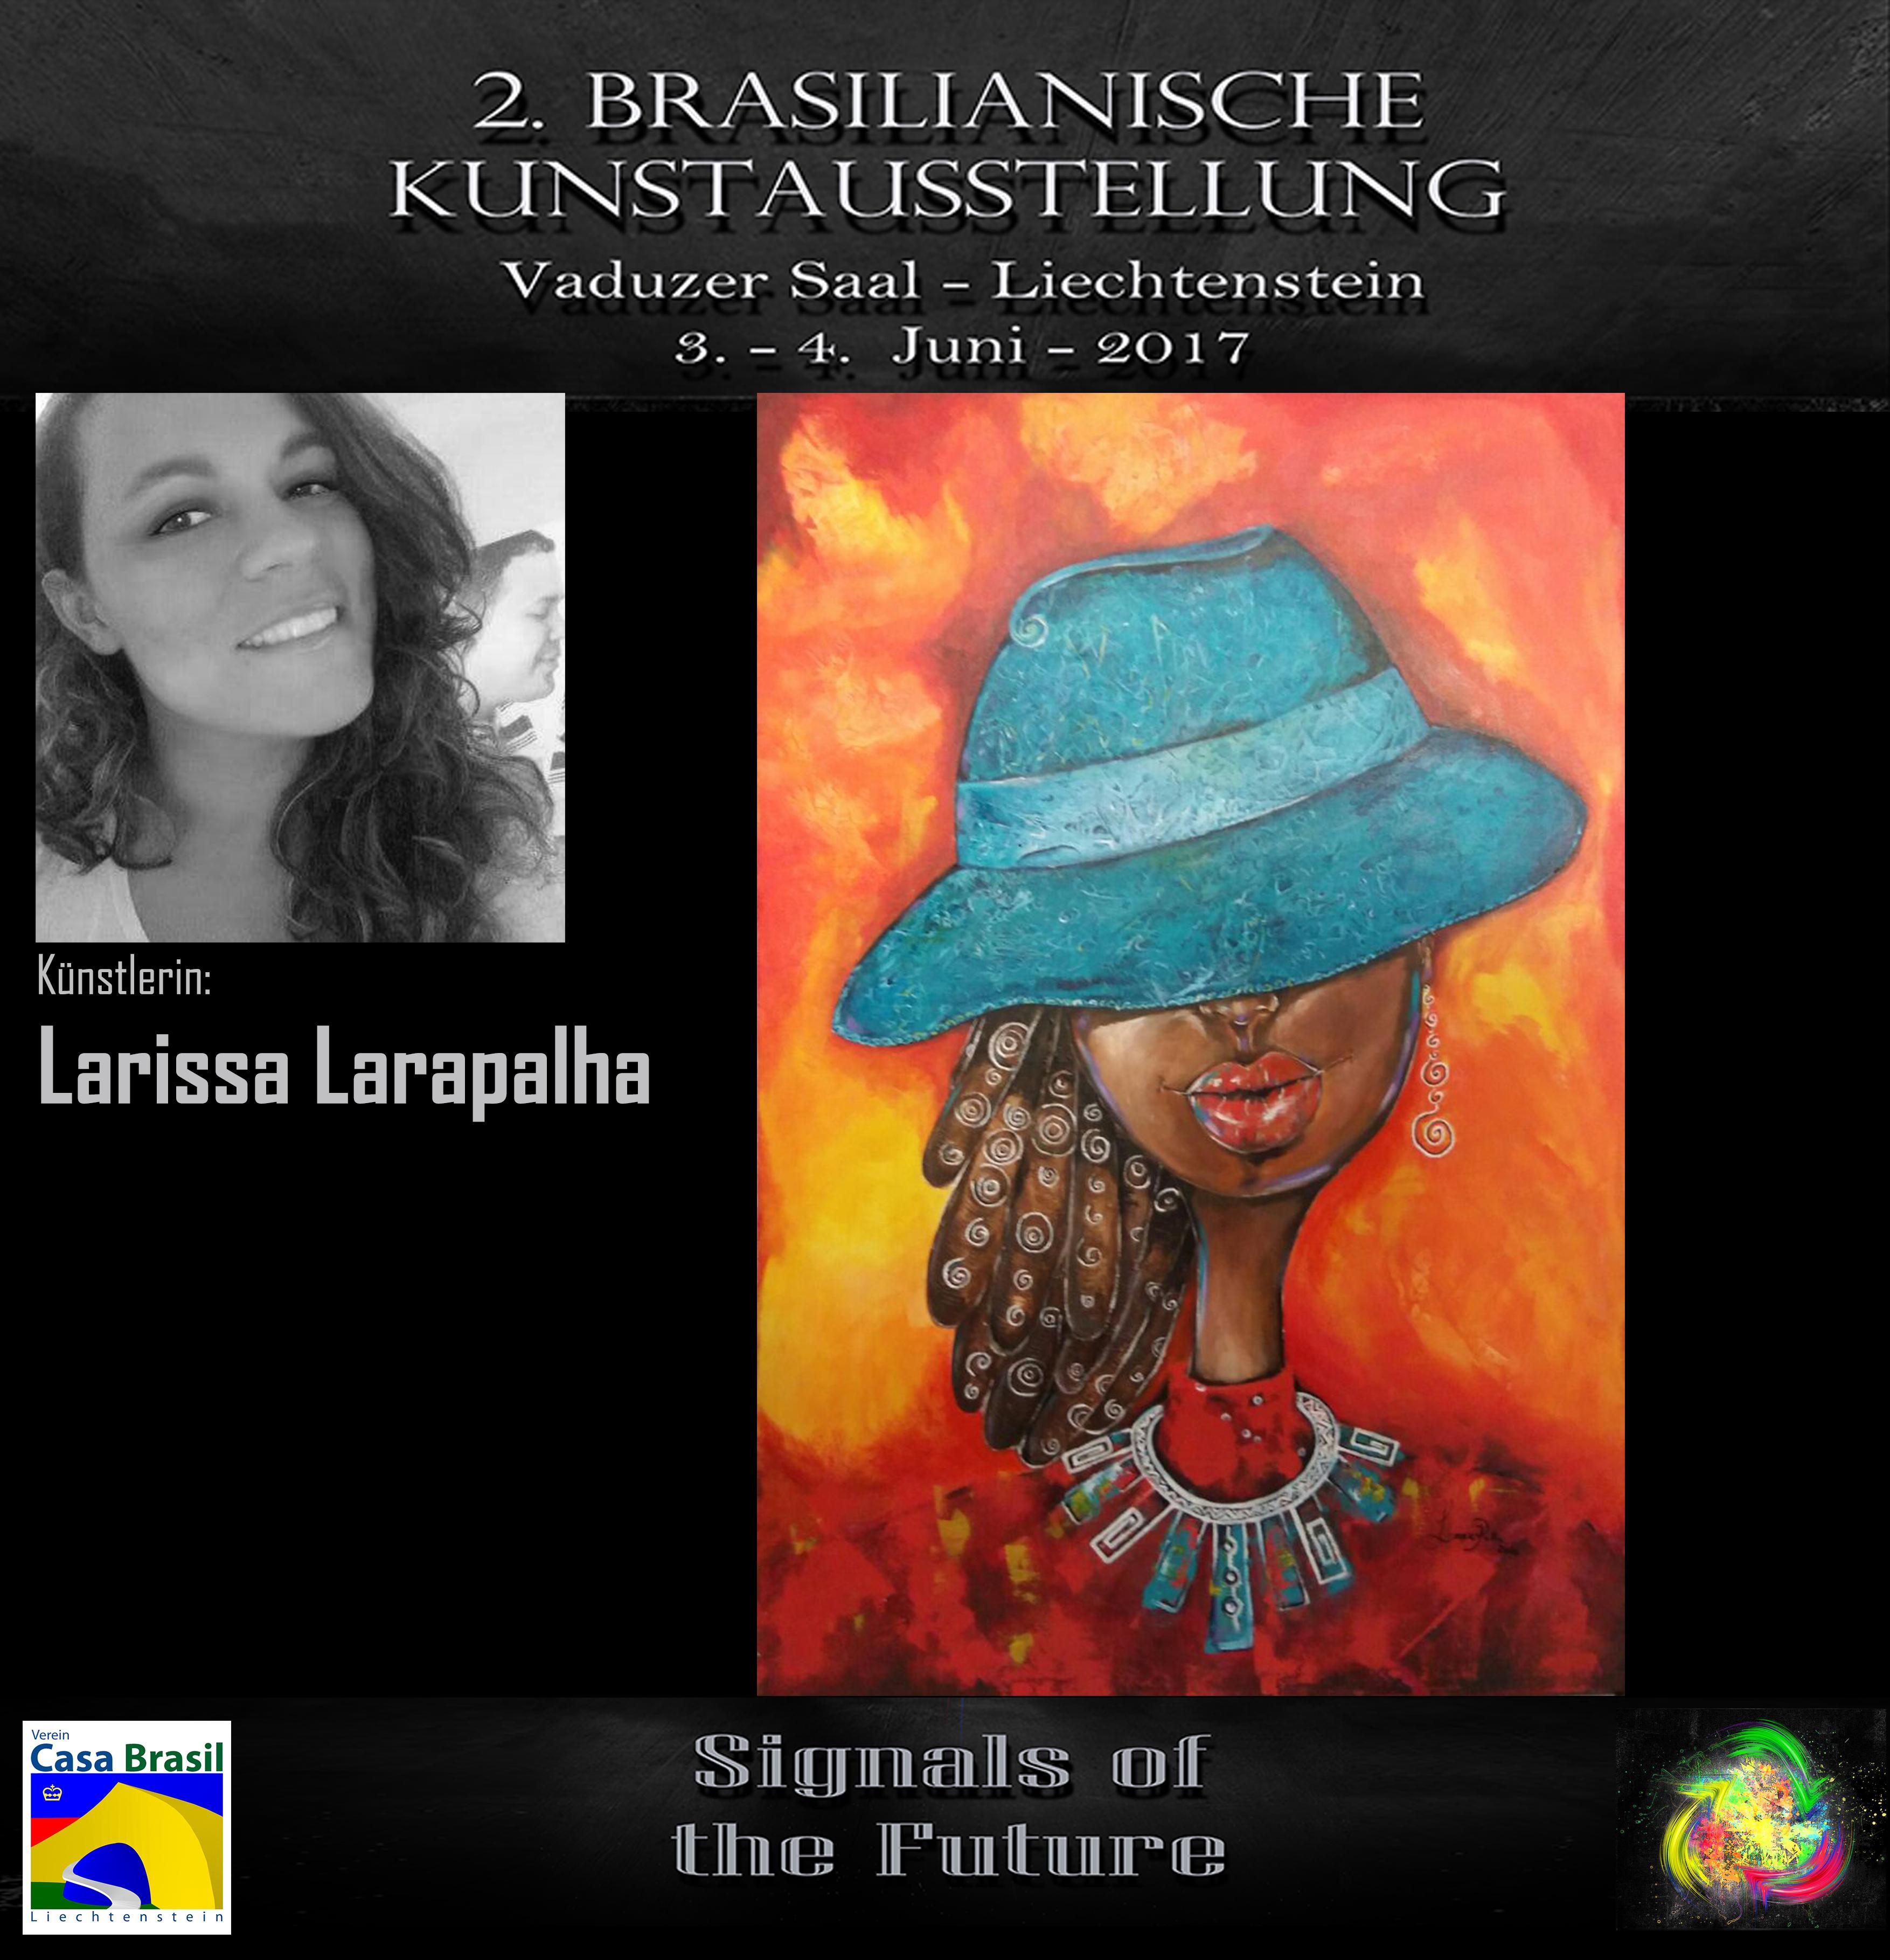 Larissa Larapalha